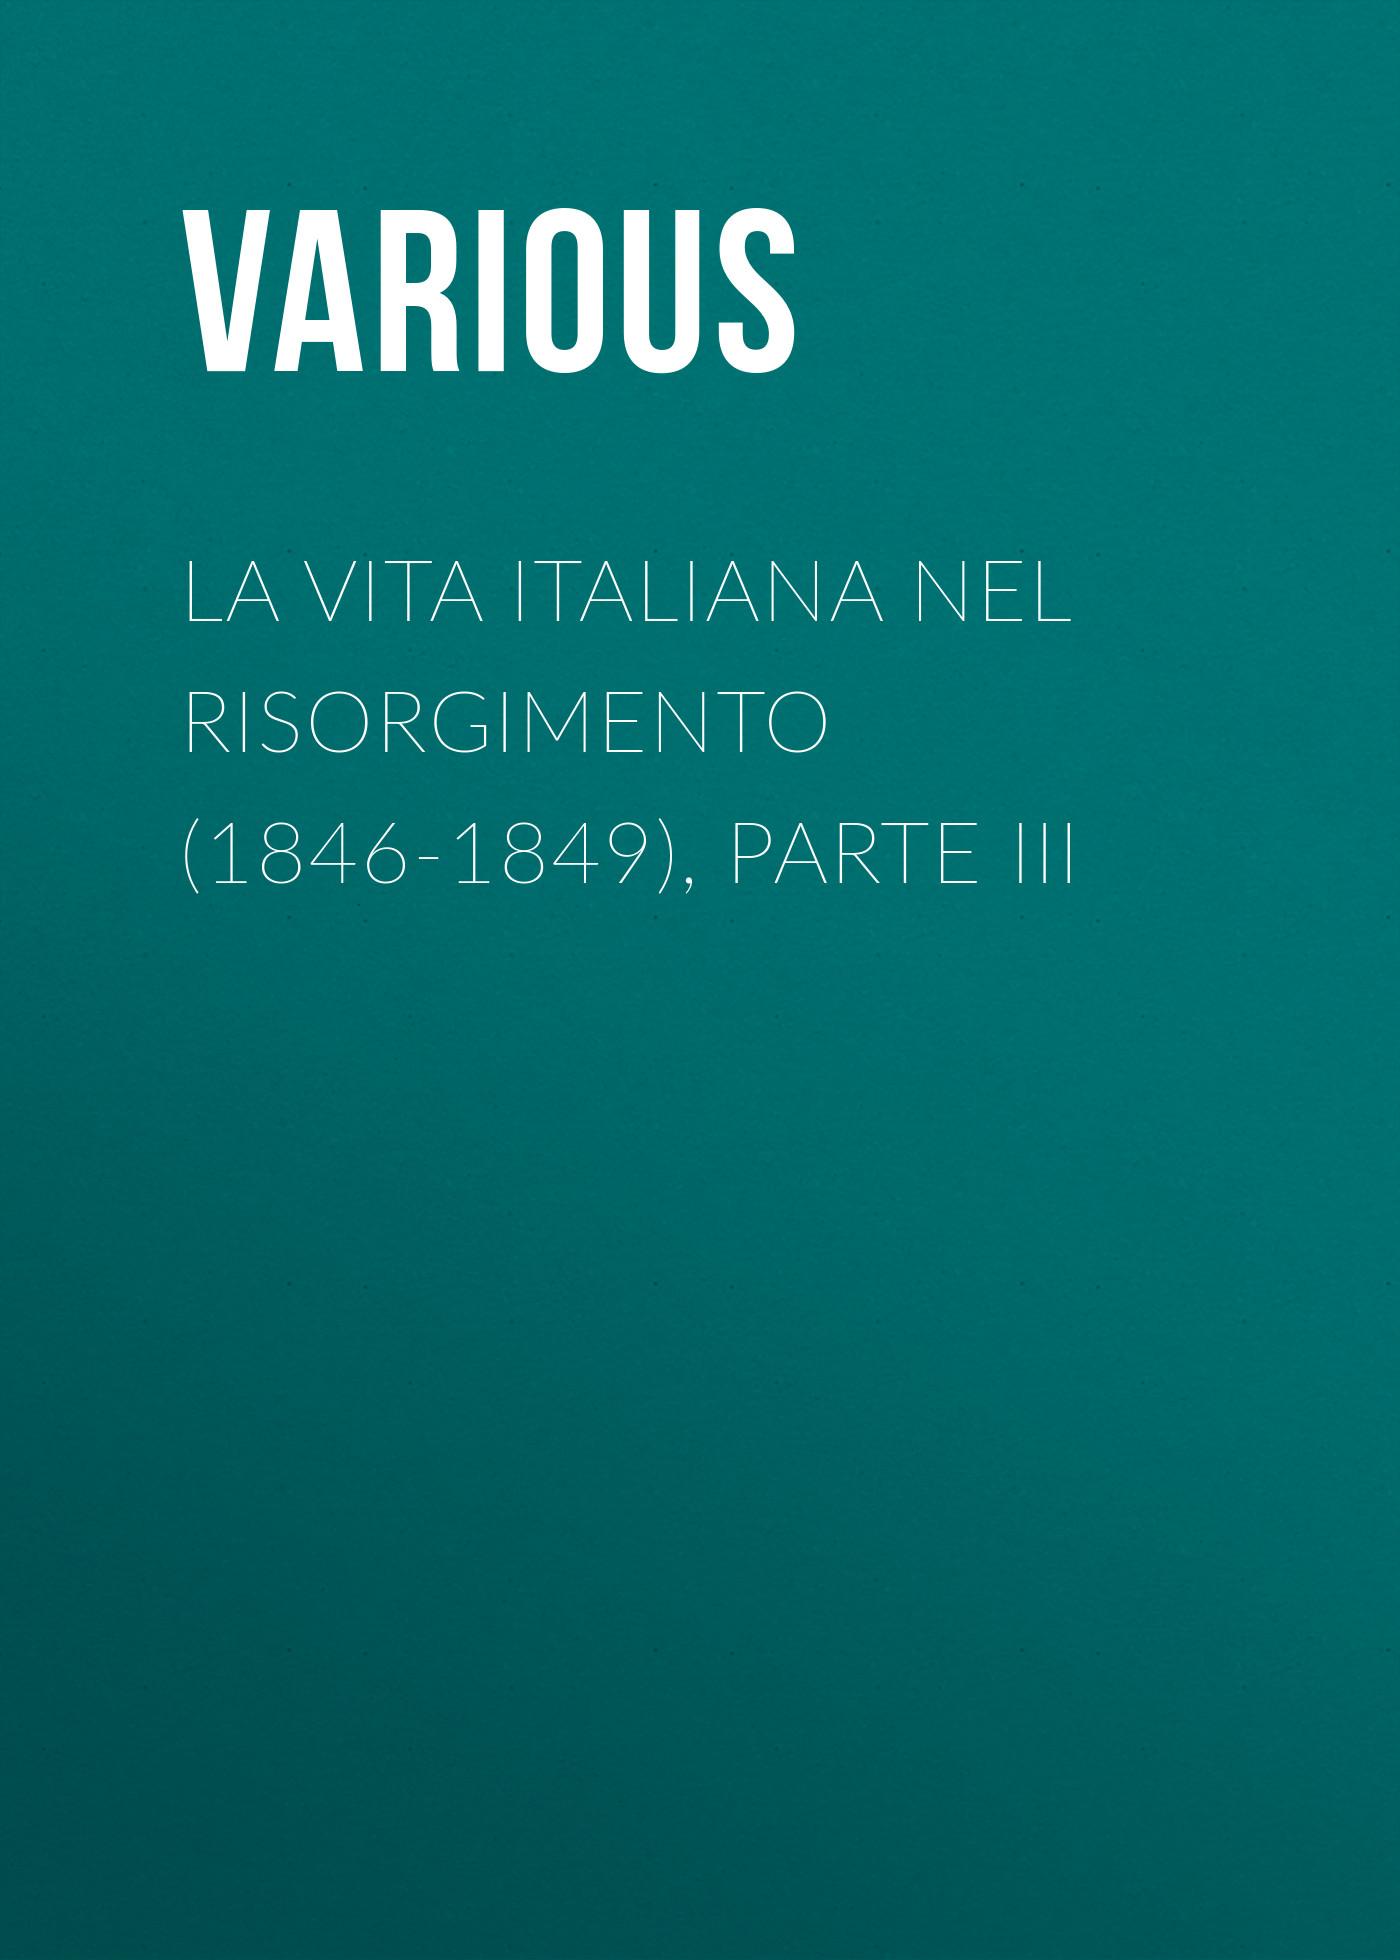 цены на Various La vita Italiana nel Risorgimento (1846-1849), parte III